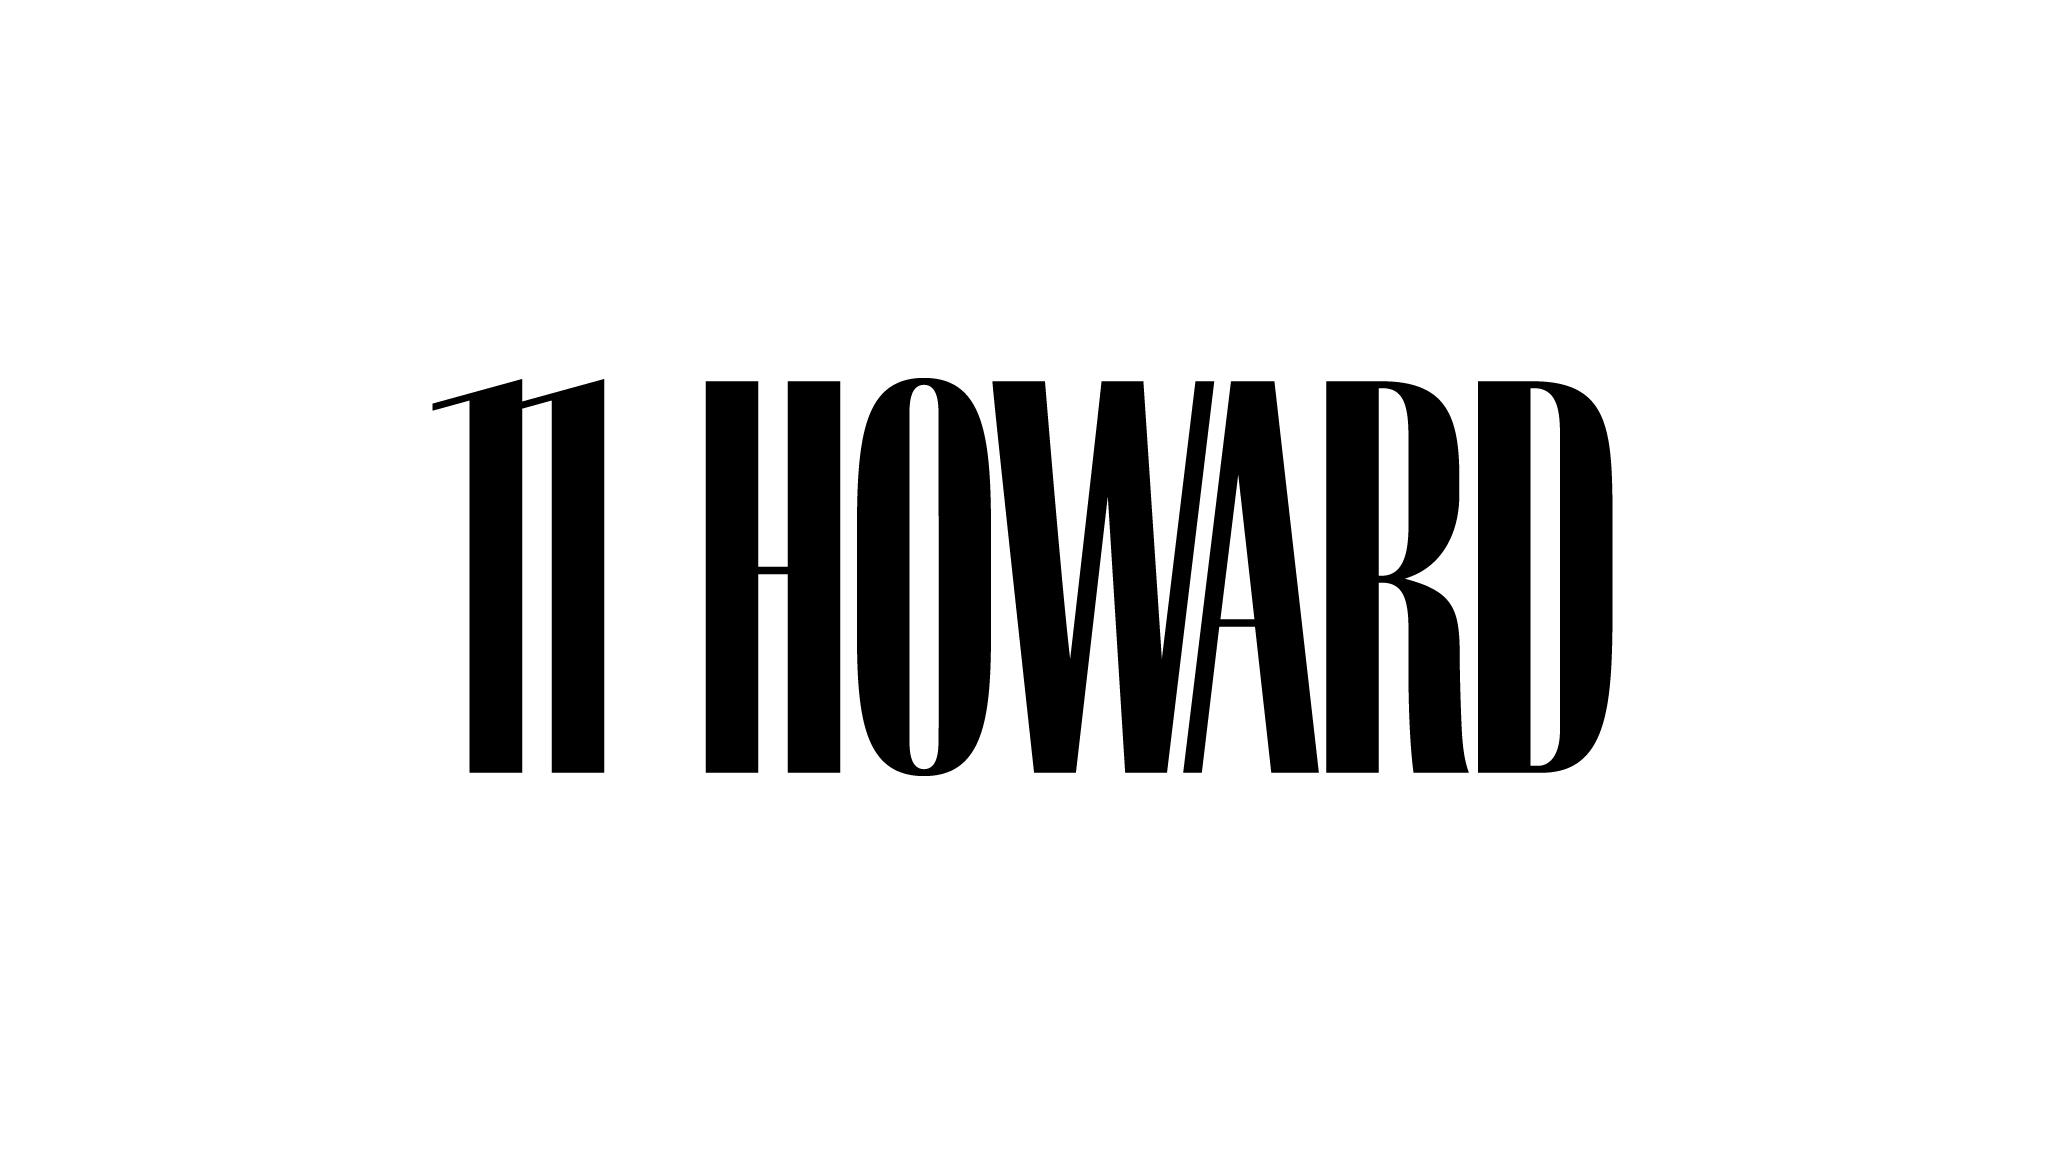 11-Howard-Logotype-2048x1160.png